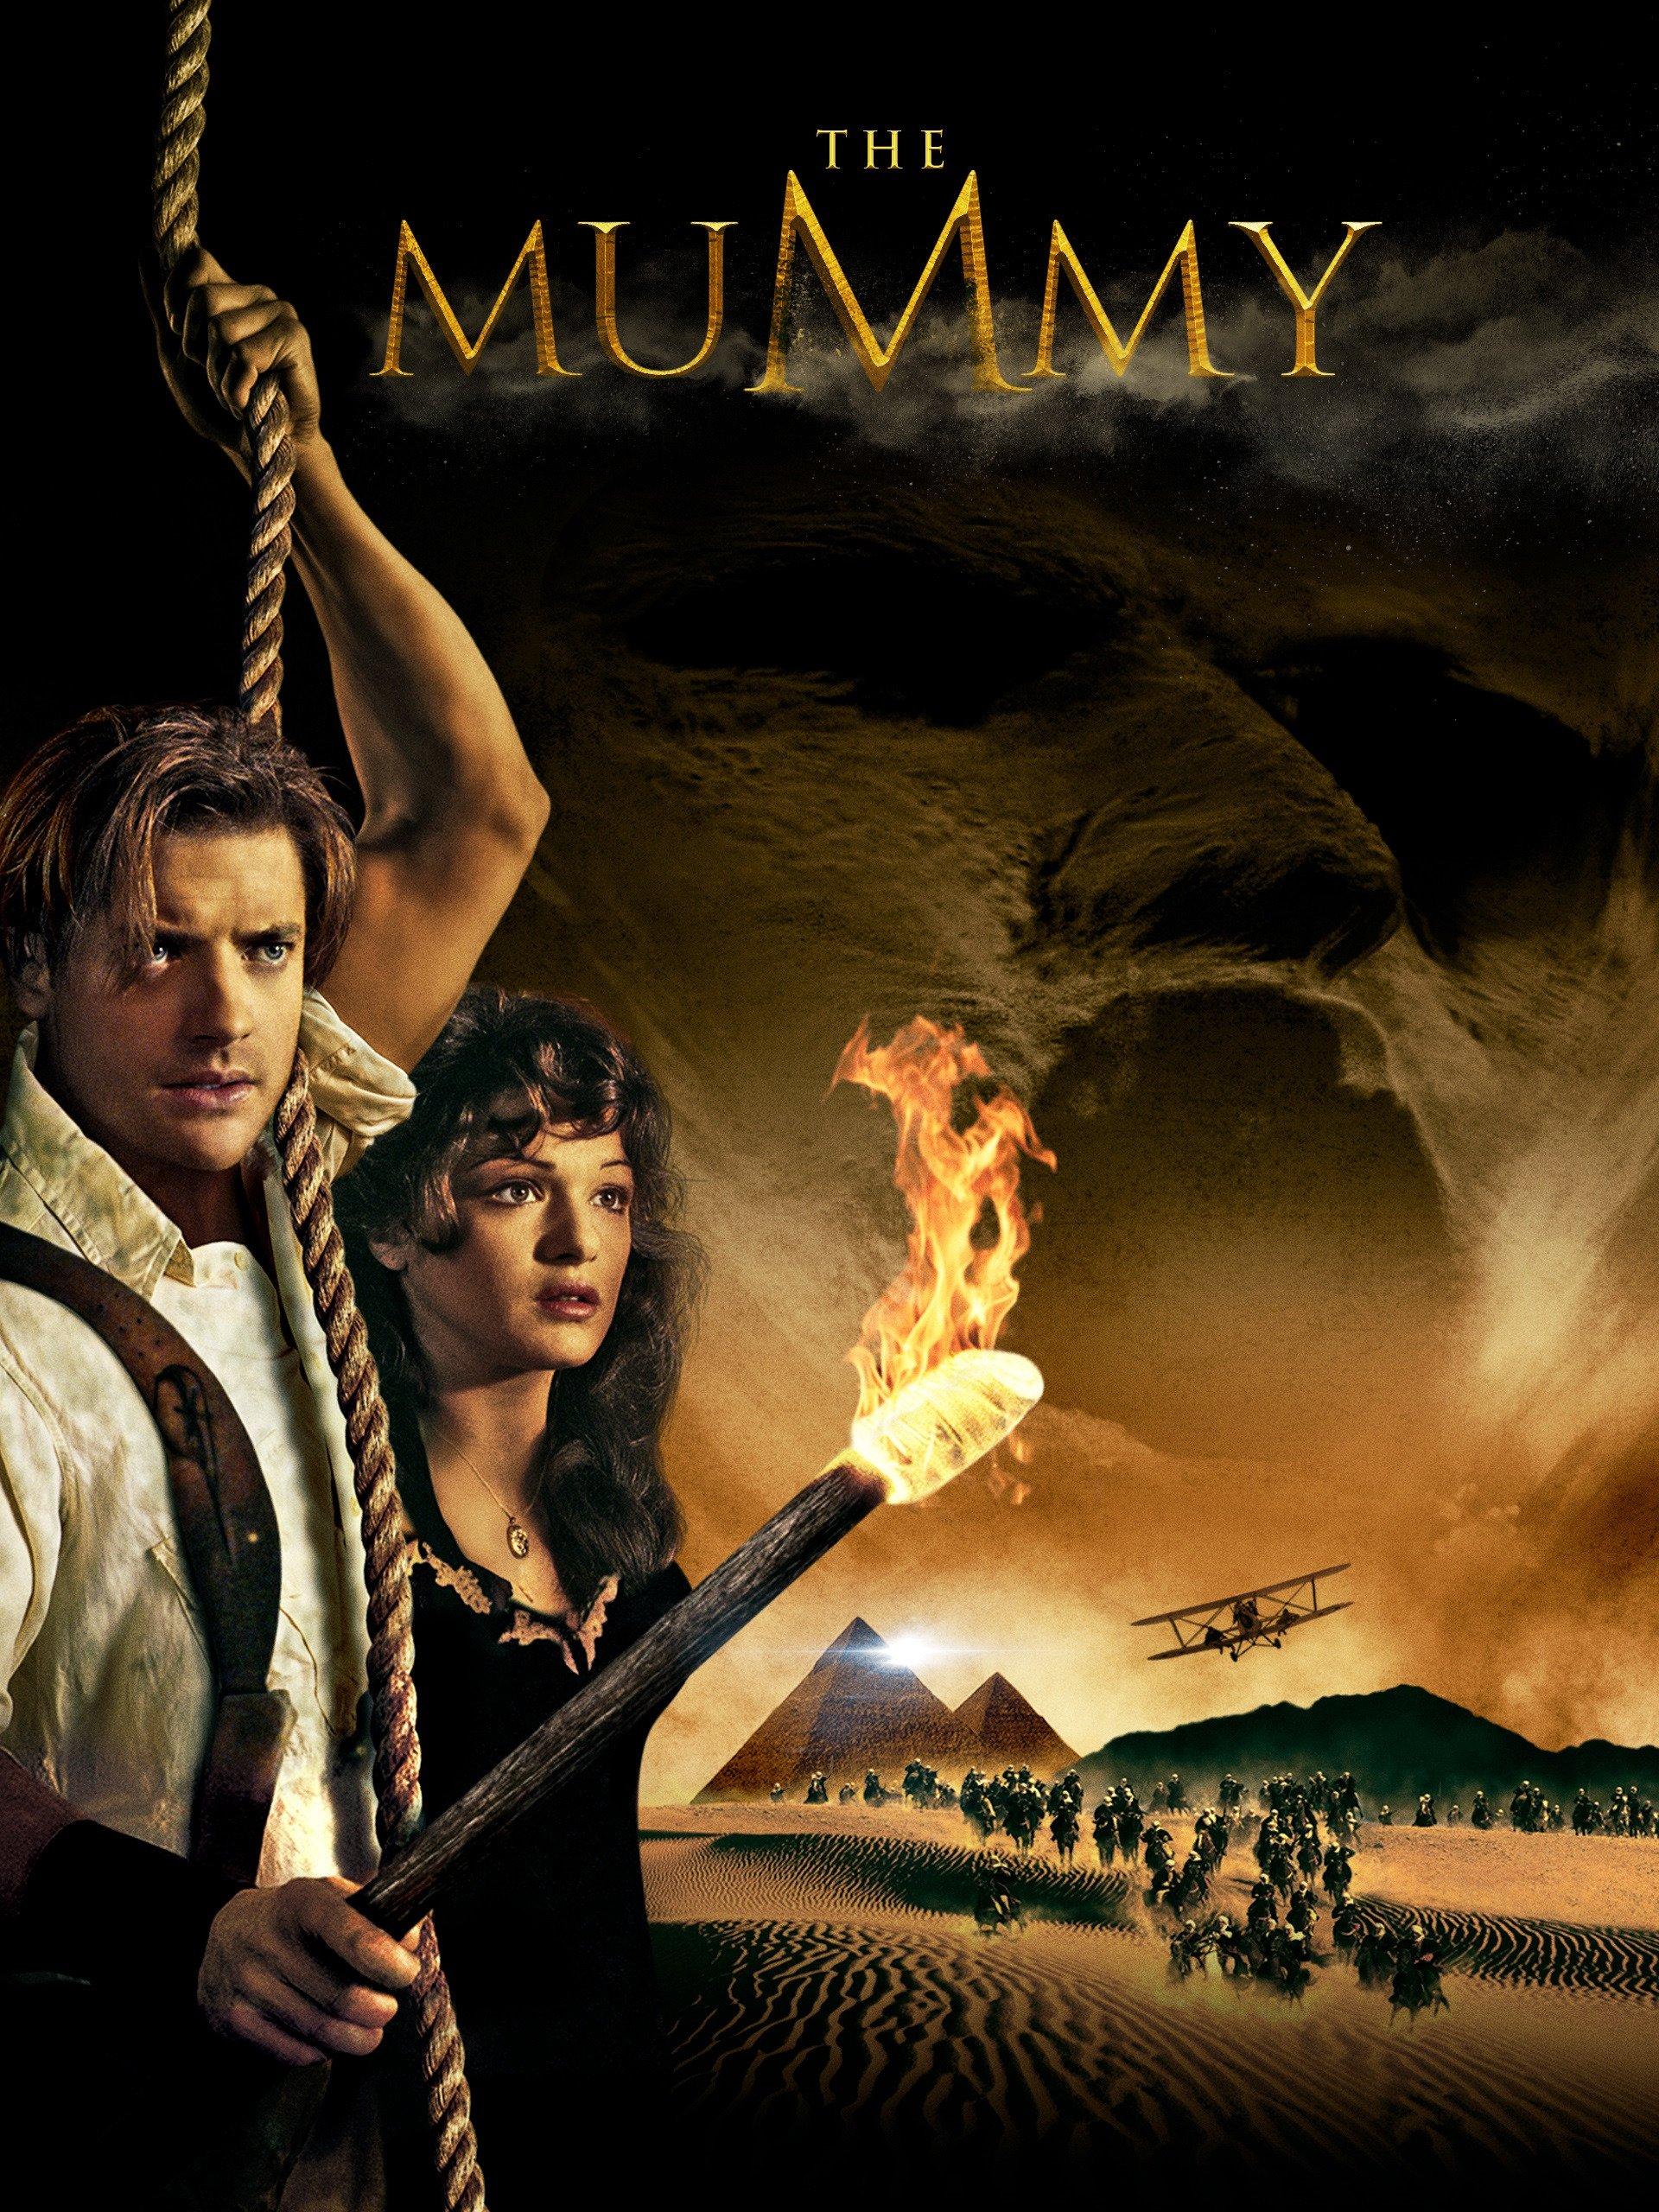 The mummy full movie in hindi online